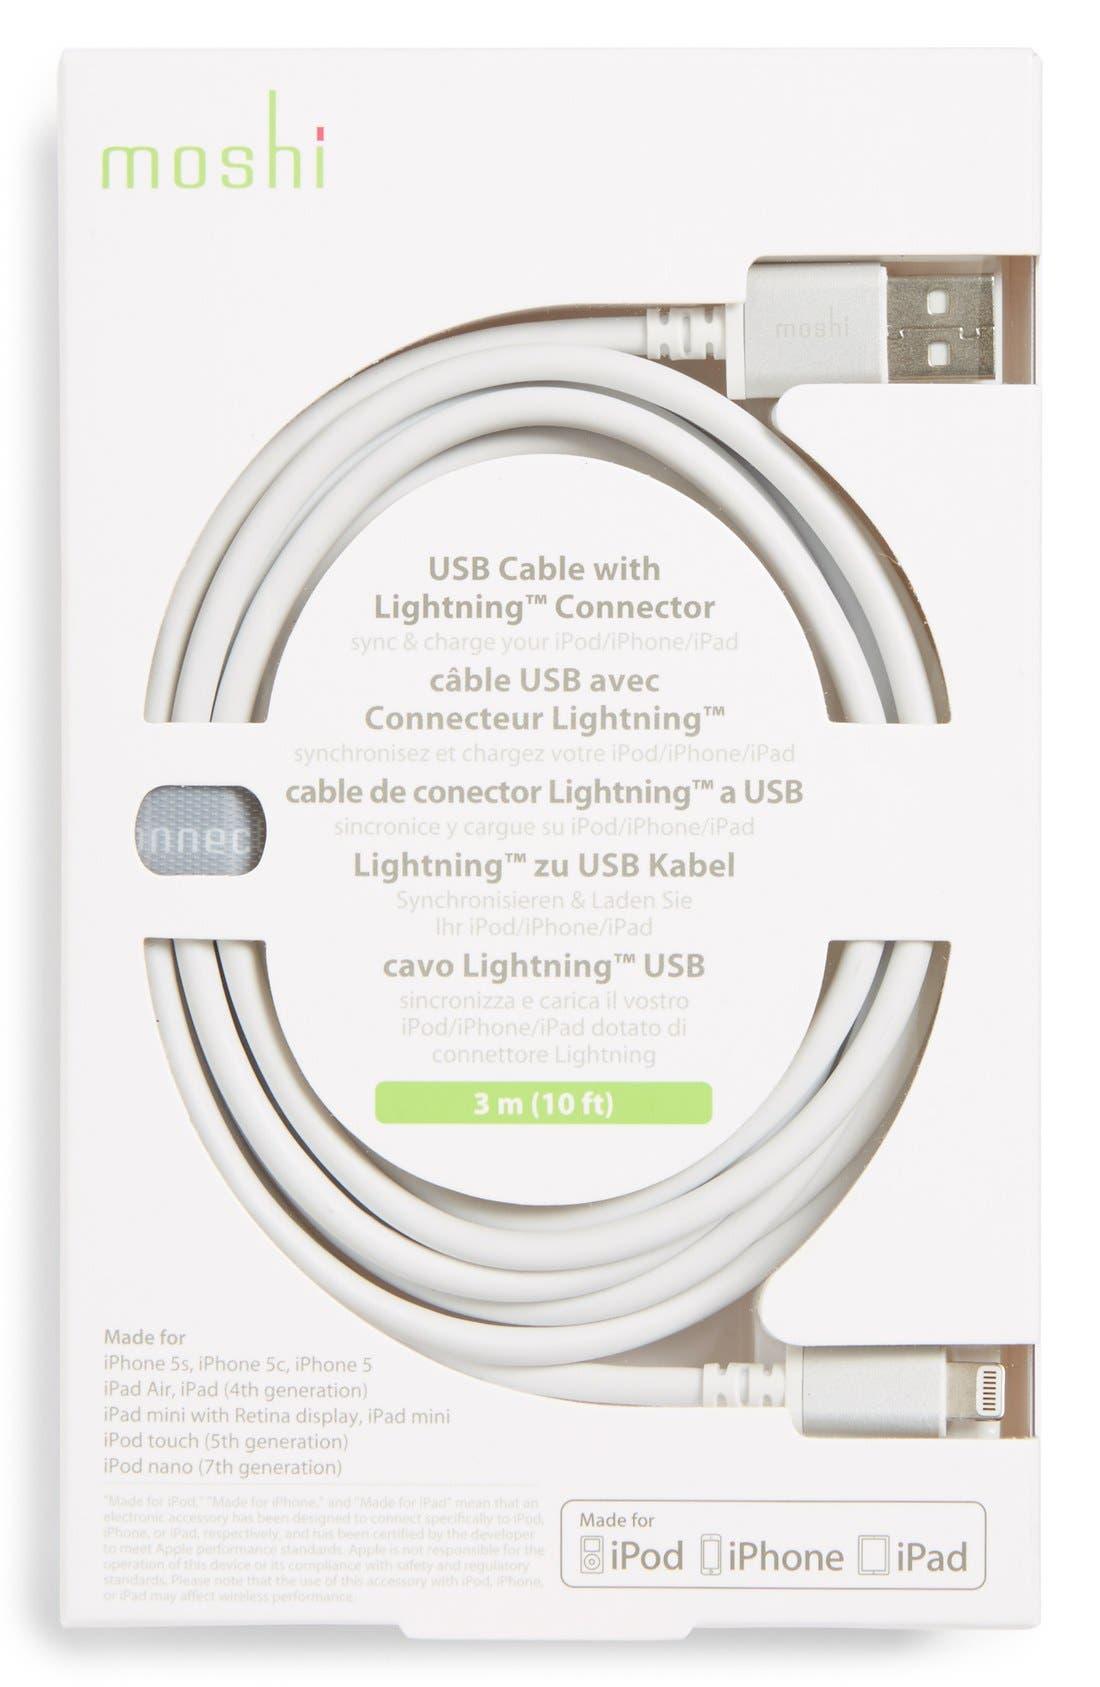 Moshi Lightning™ USB Cable